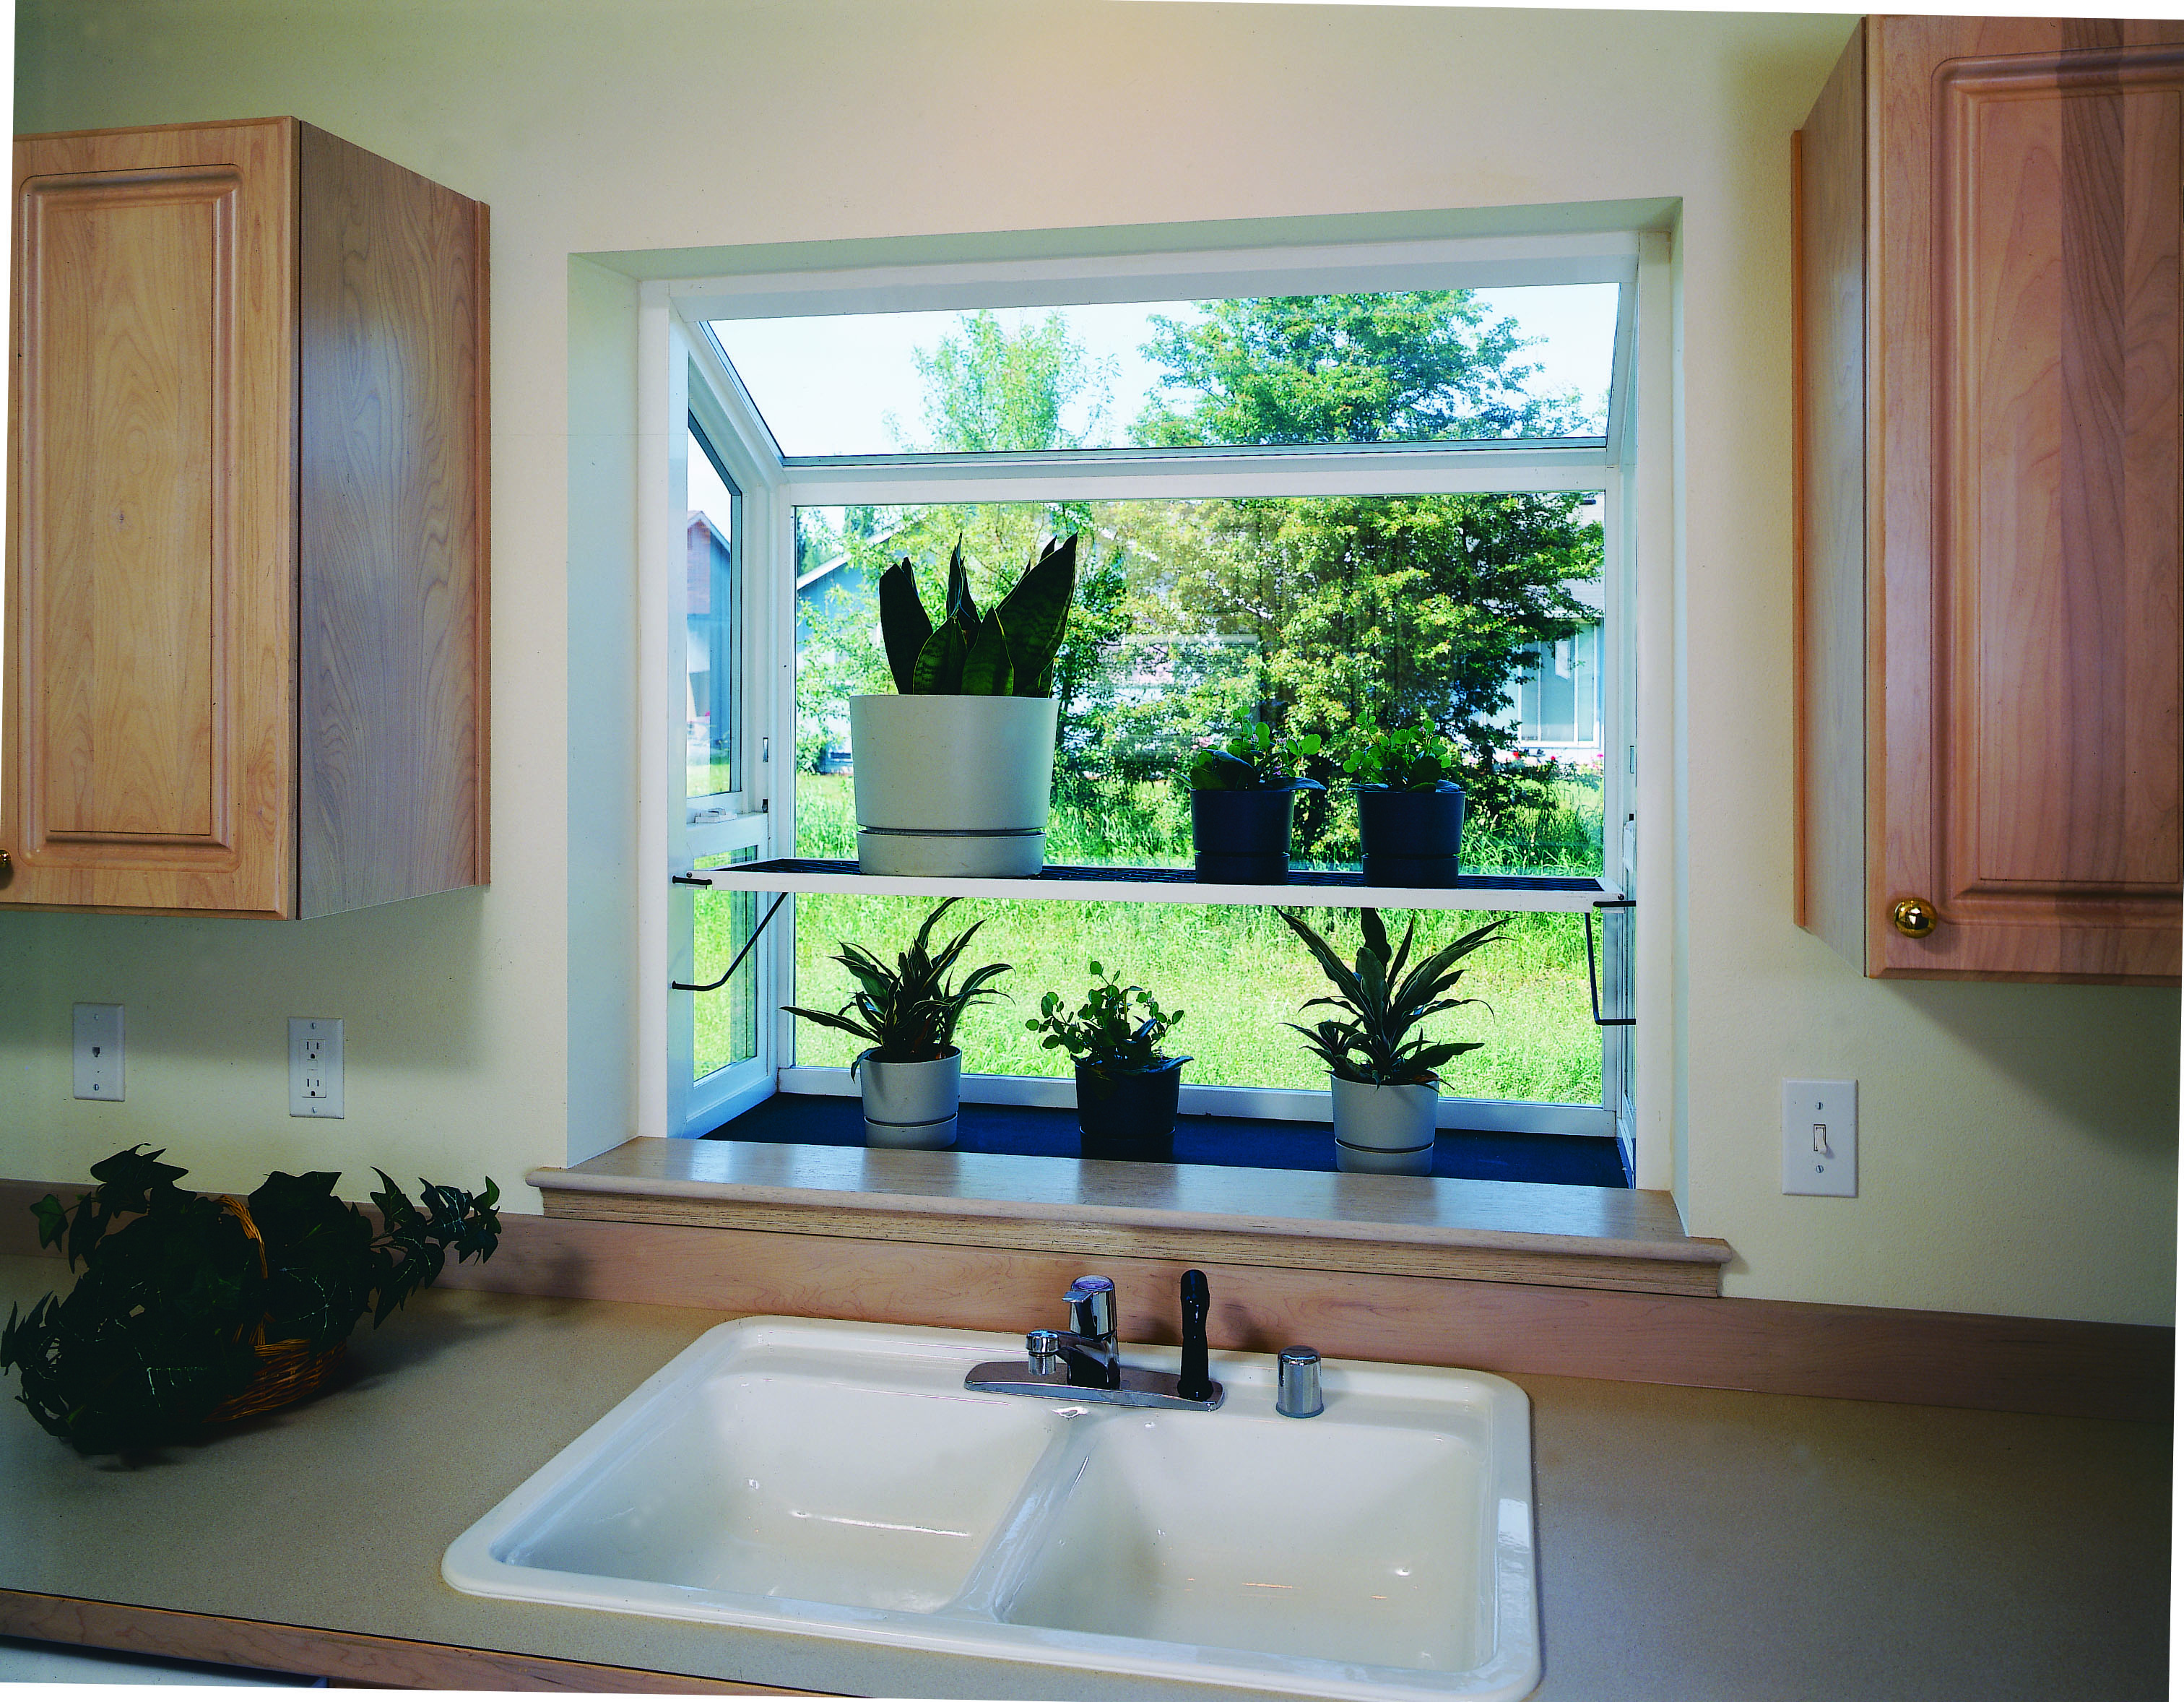 Window World Product Photo Gallery Cottonwood, AZ